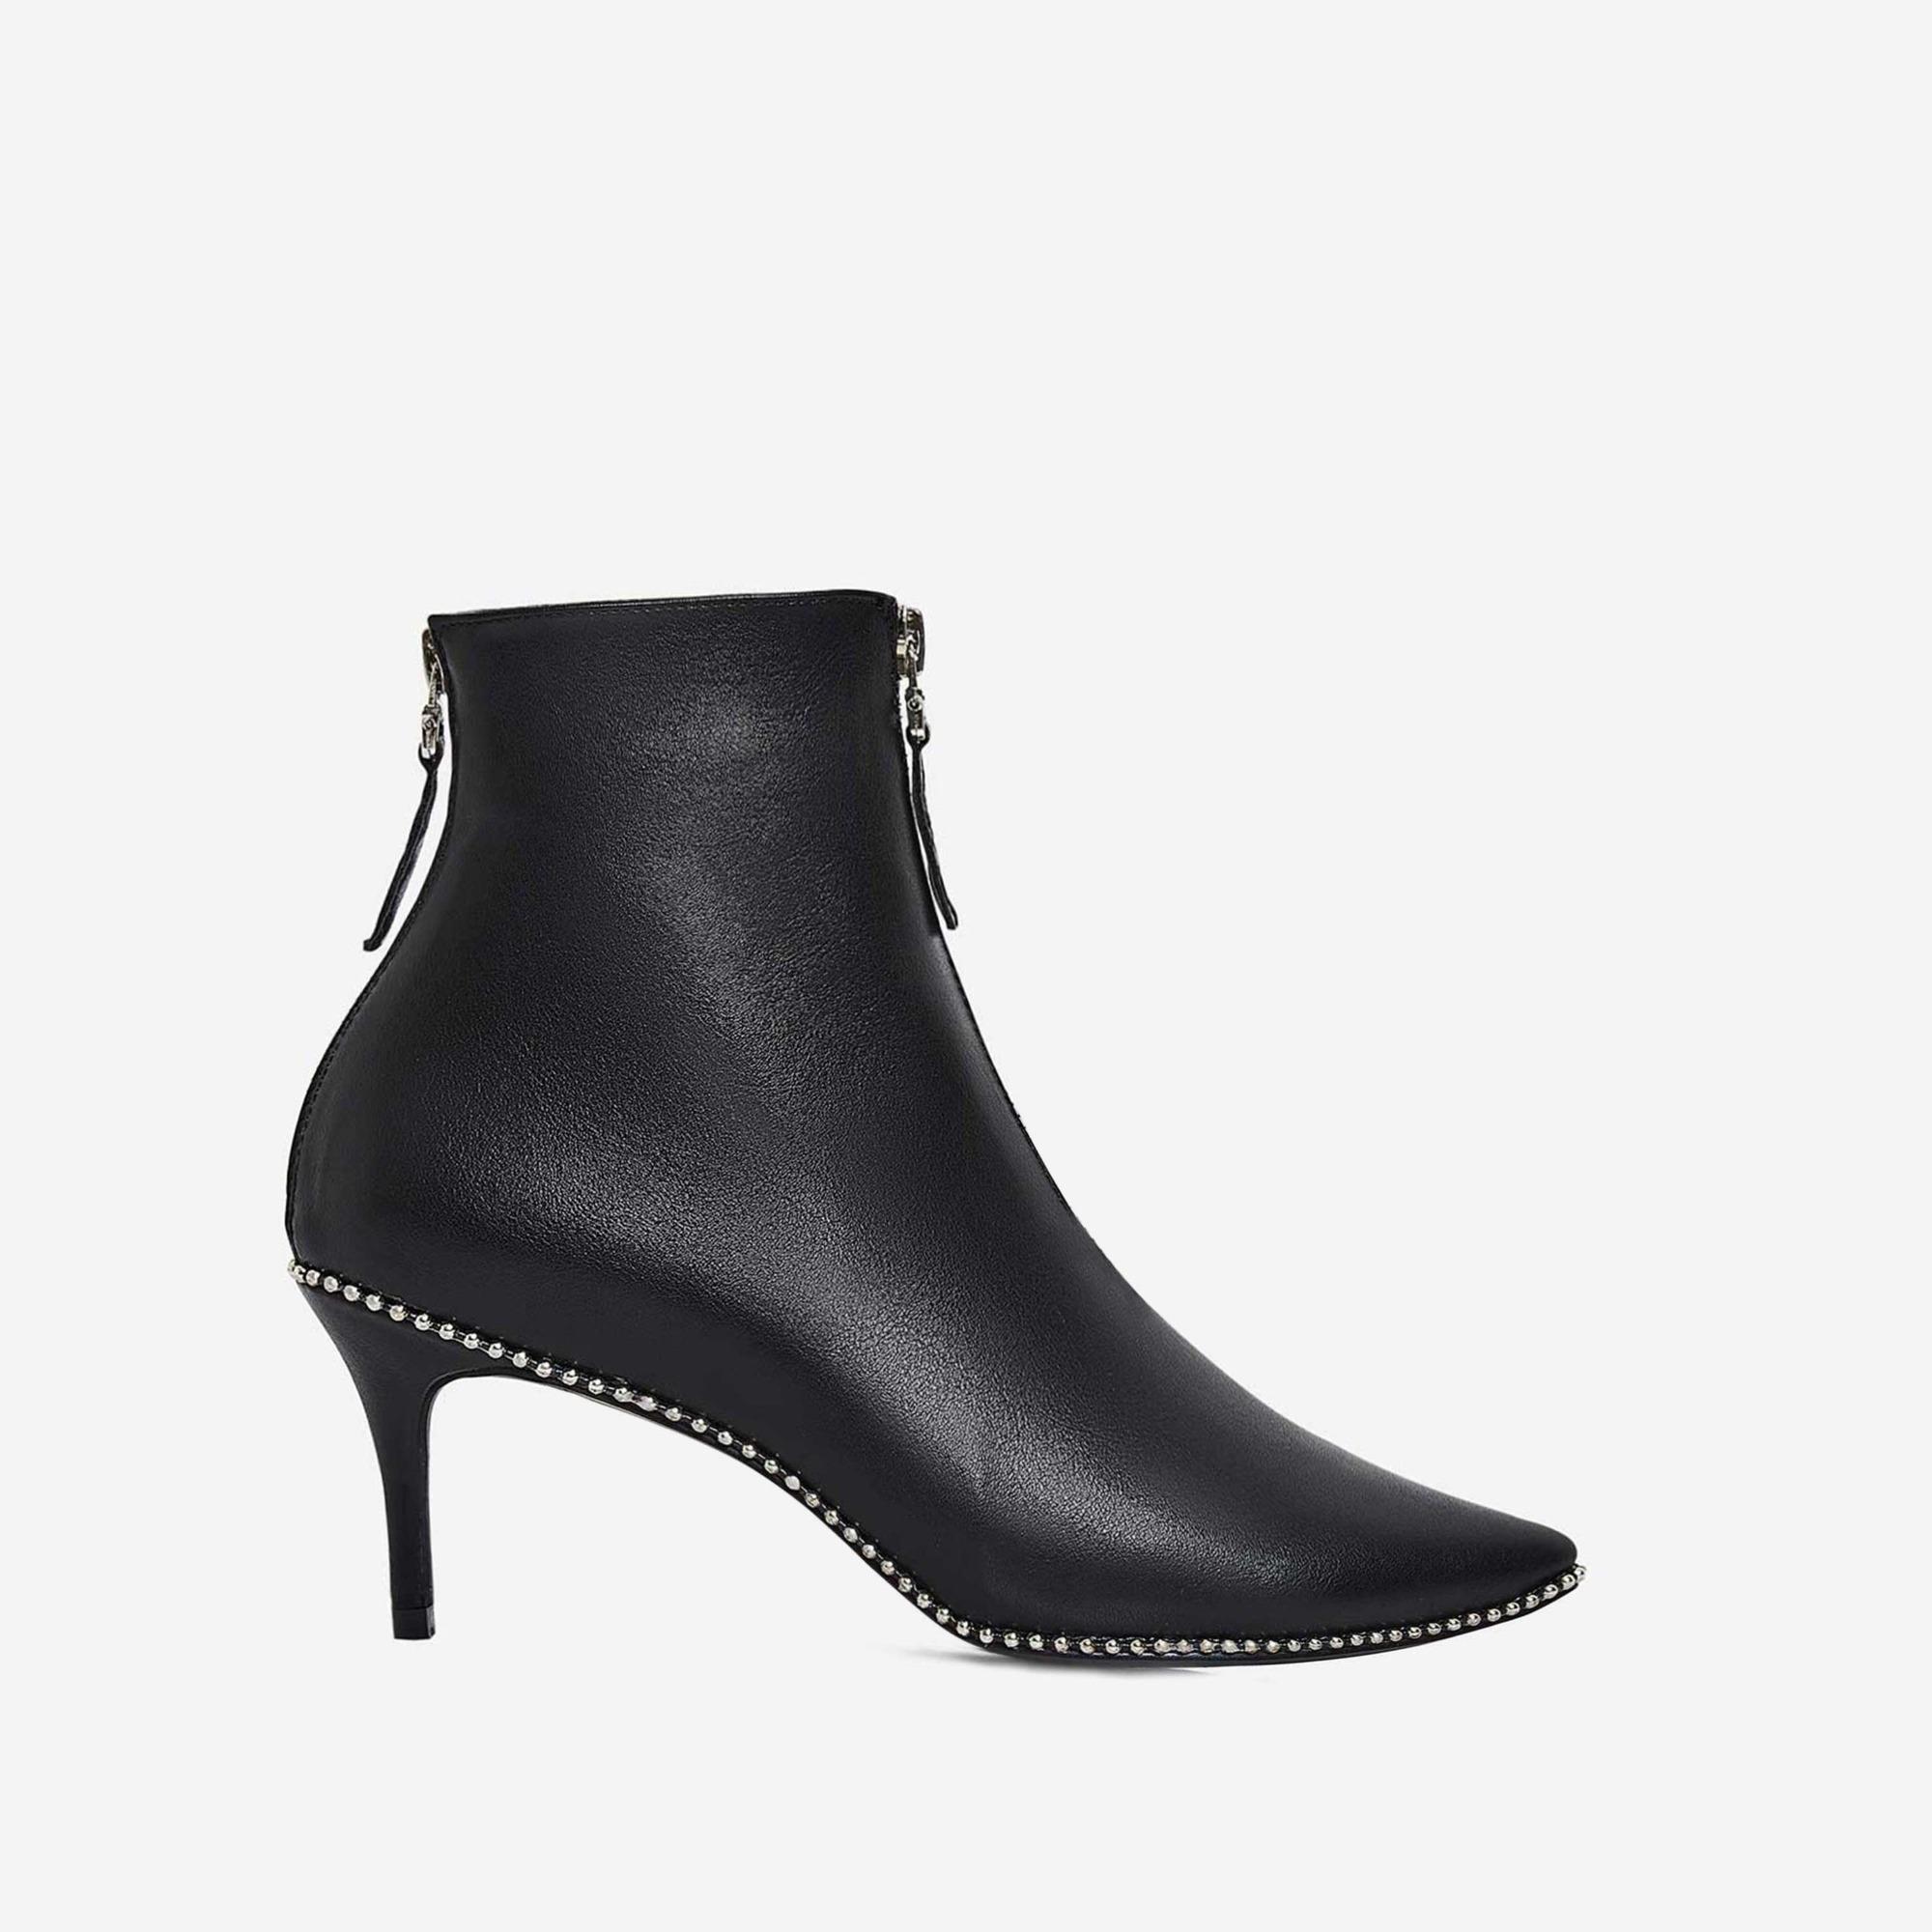 Kasey Studded Detail Kitten Heel Ankle Boot In Black Faux Leather